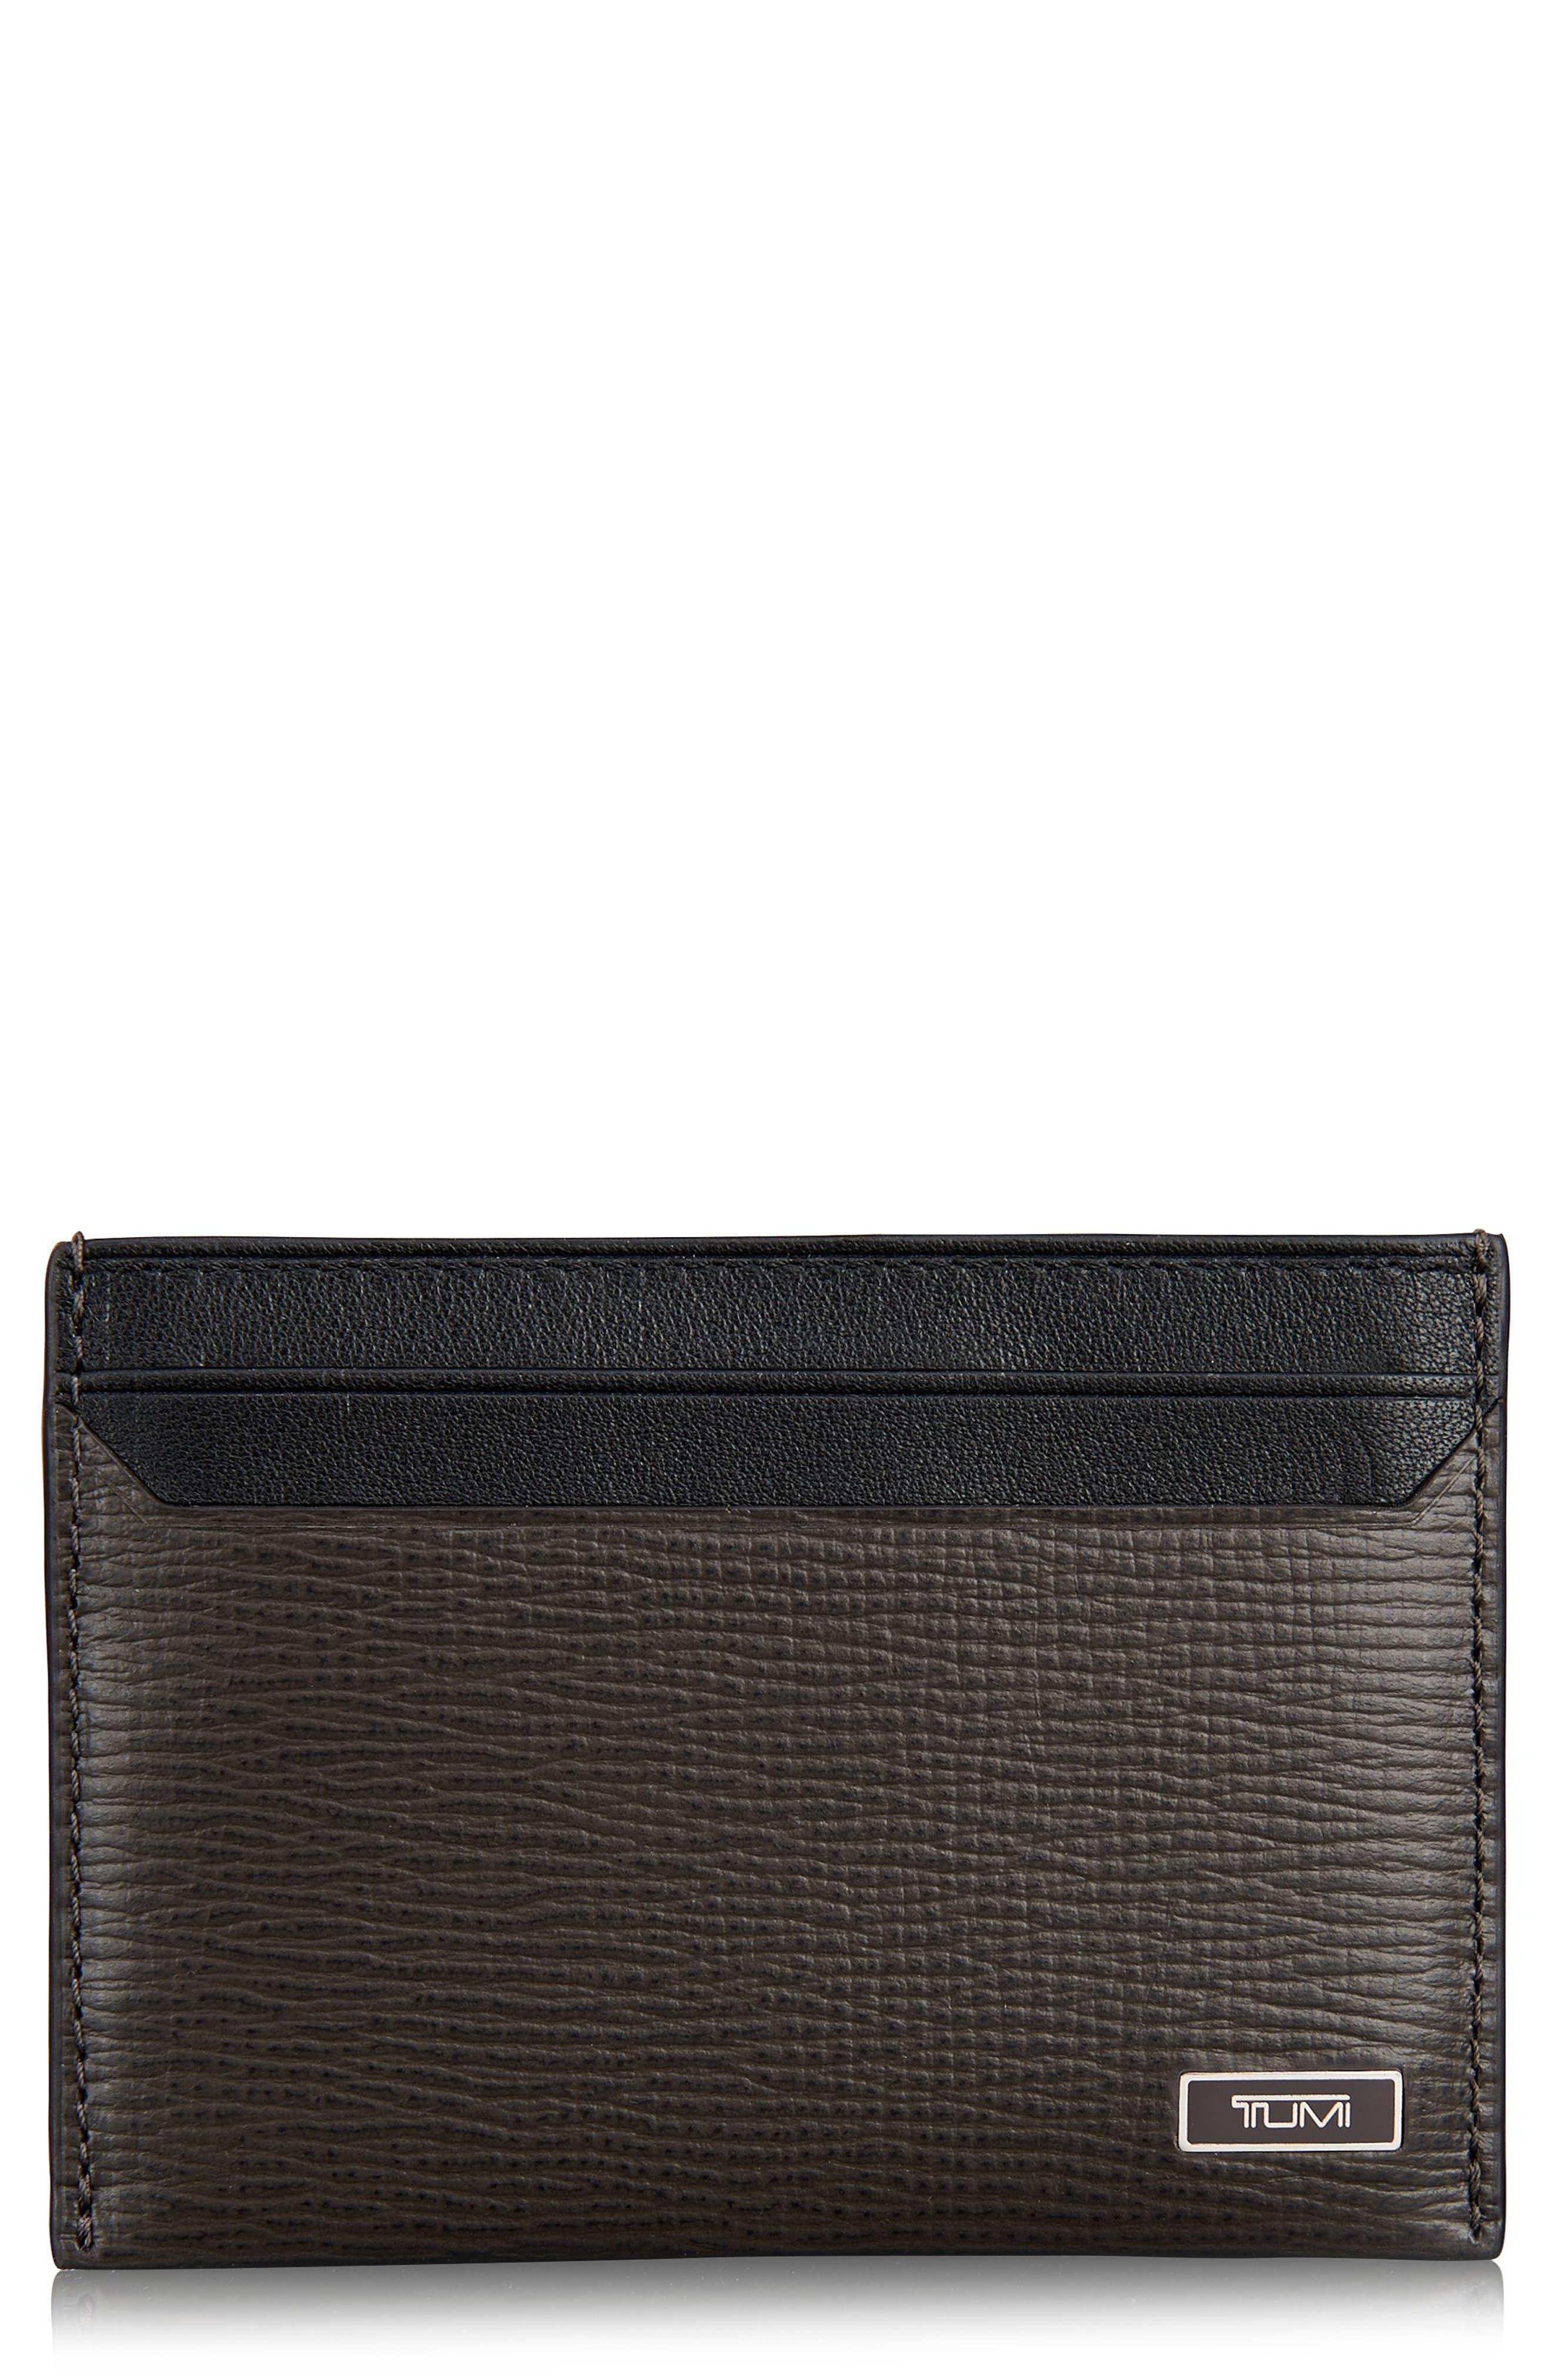 Monaco Leather Card Case,                         Main,                         color, Taupe